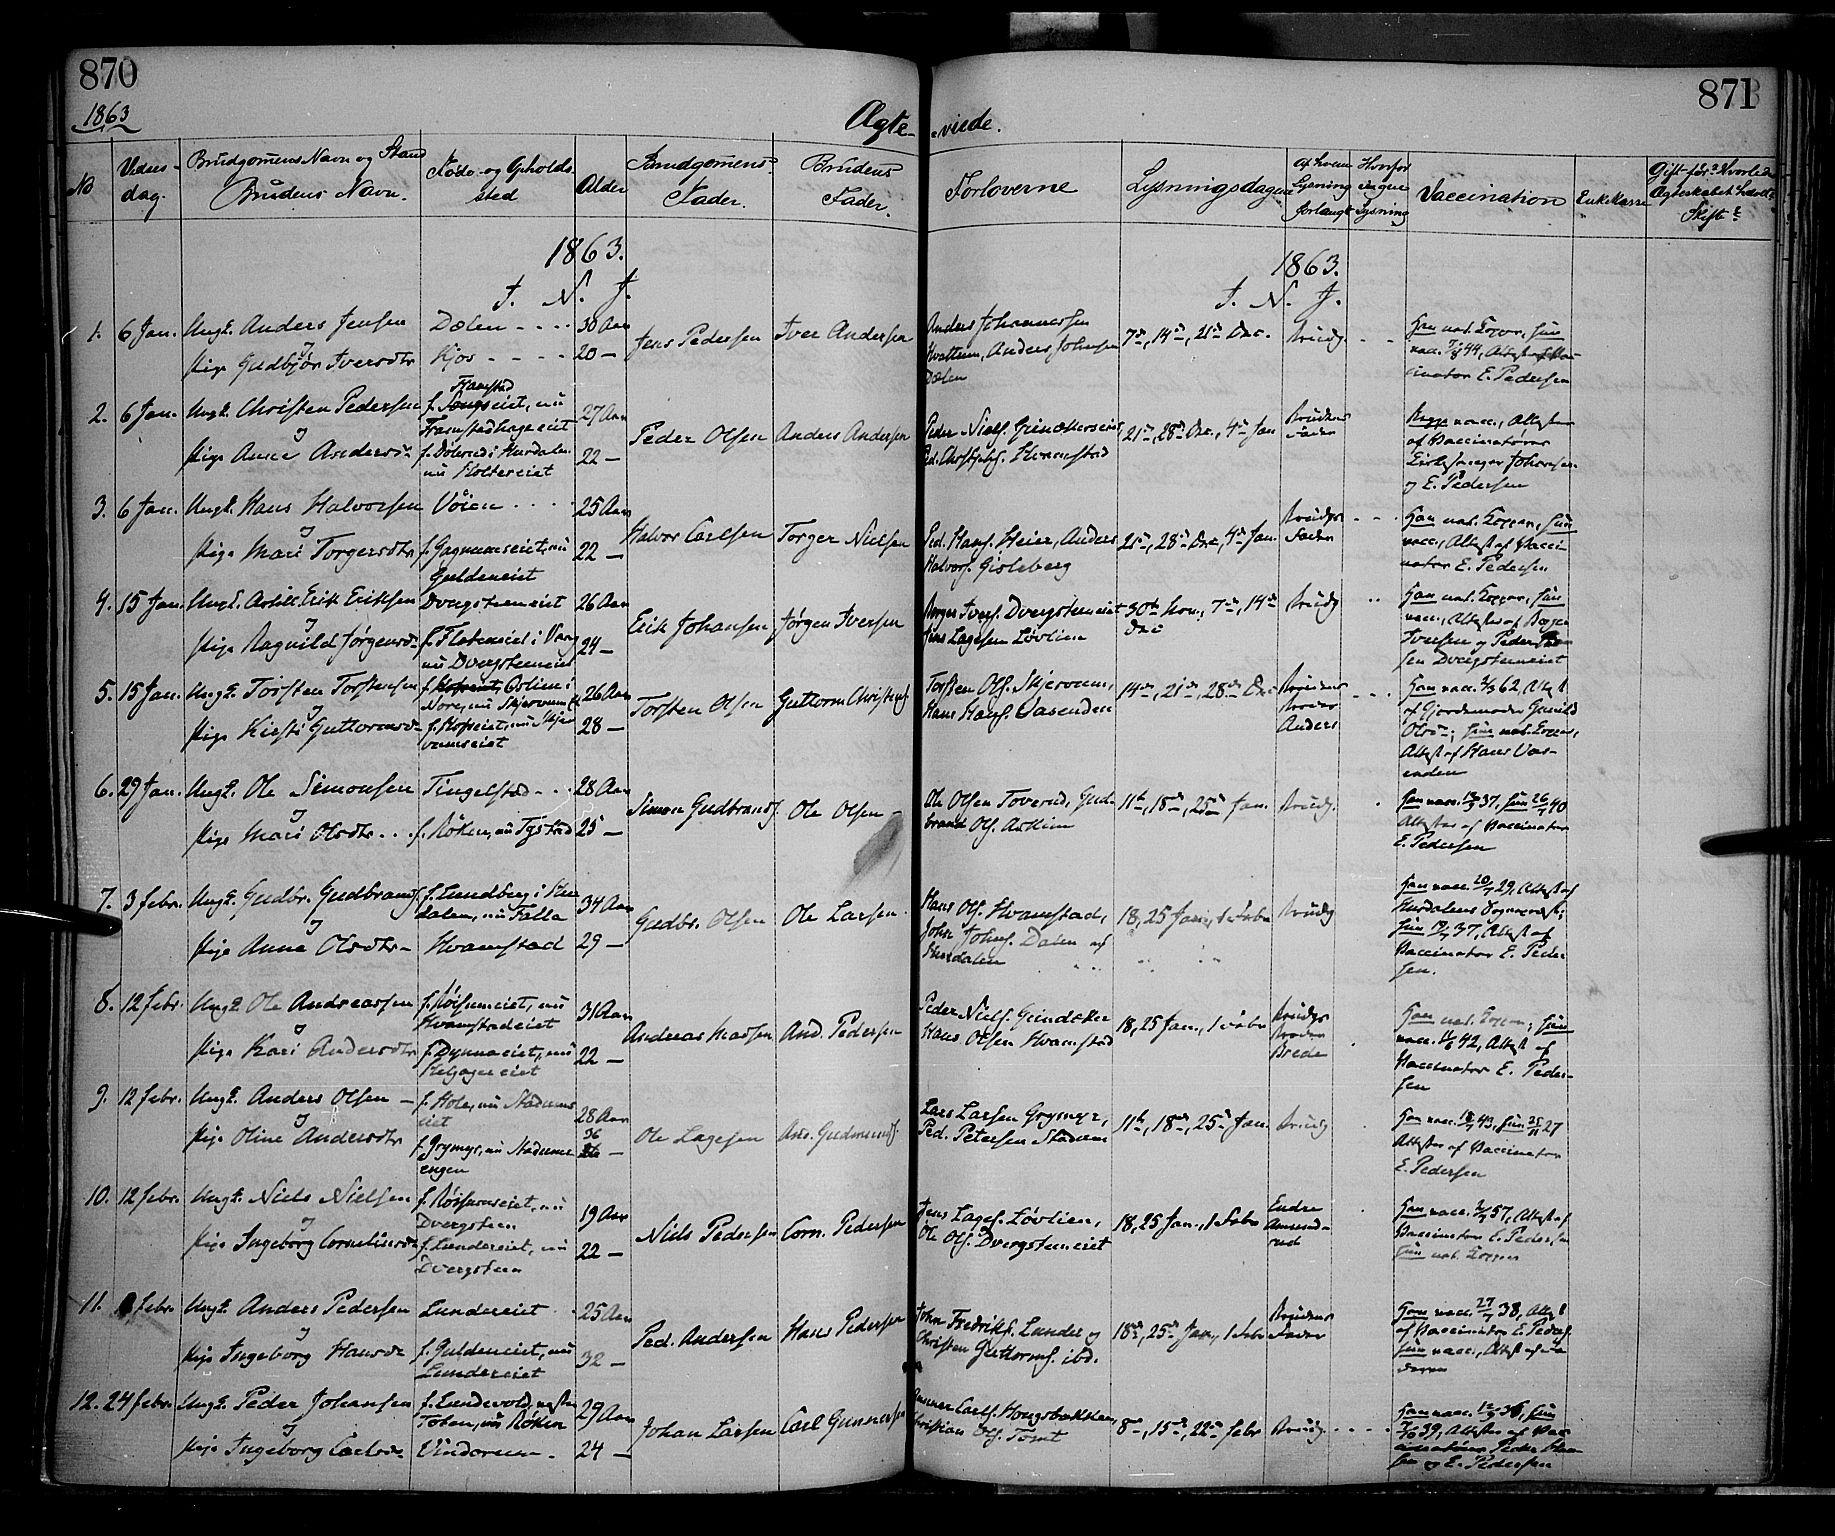 SAH, Gran prestekontor, Ministerialbok nr. 12, 1856-1874, s. 870-871